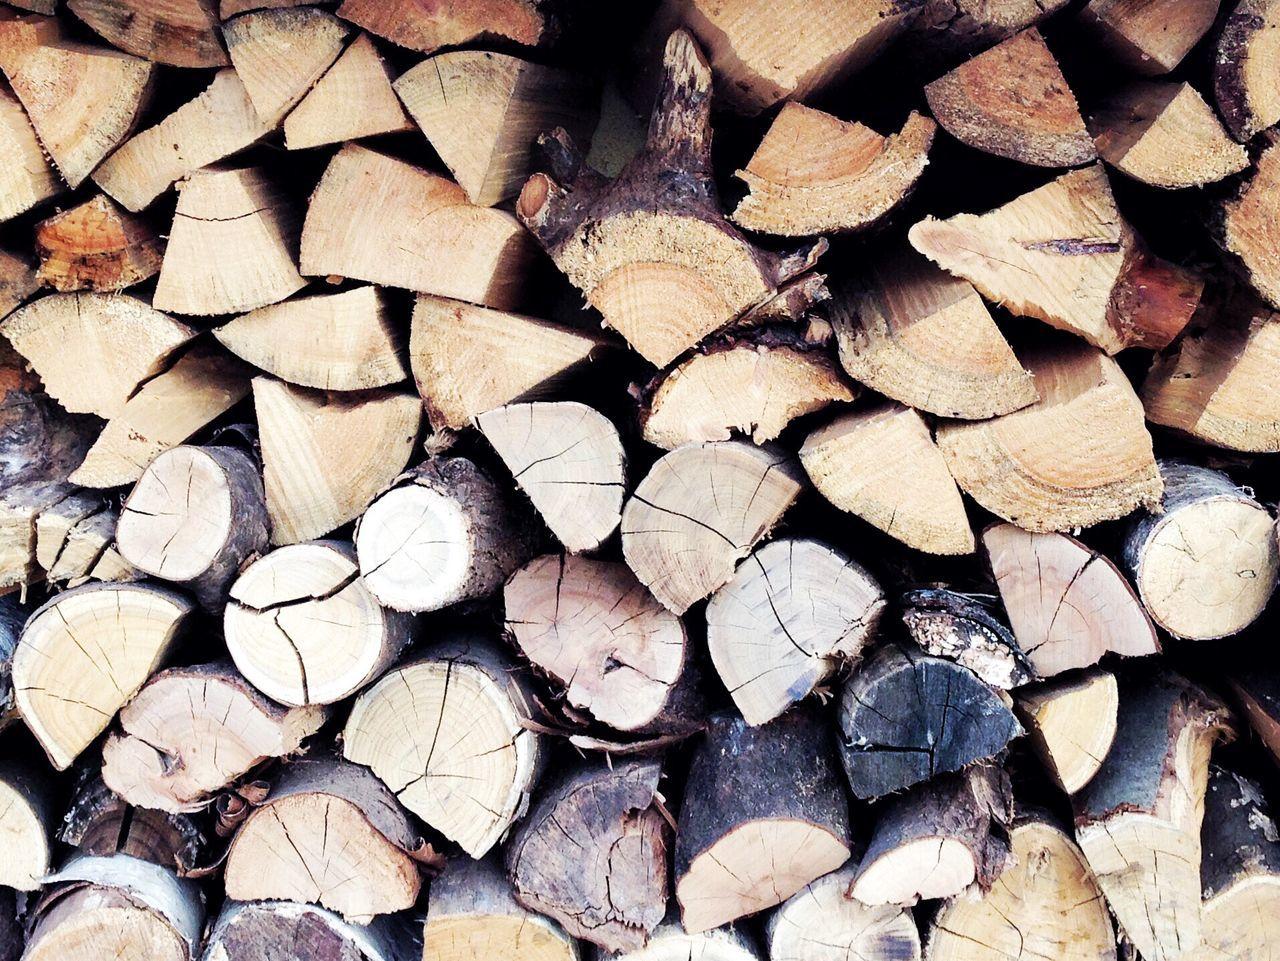 Vintage wood outside an old cabin Timber Log Firewood Stack Woodpile Backgrounds Deforestation Wood - Material Pattern Mountain Vintage Folk